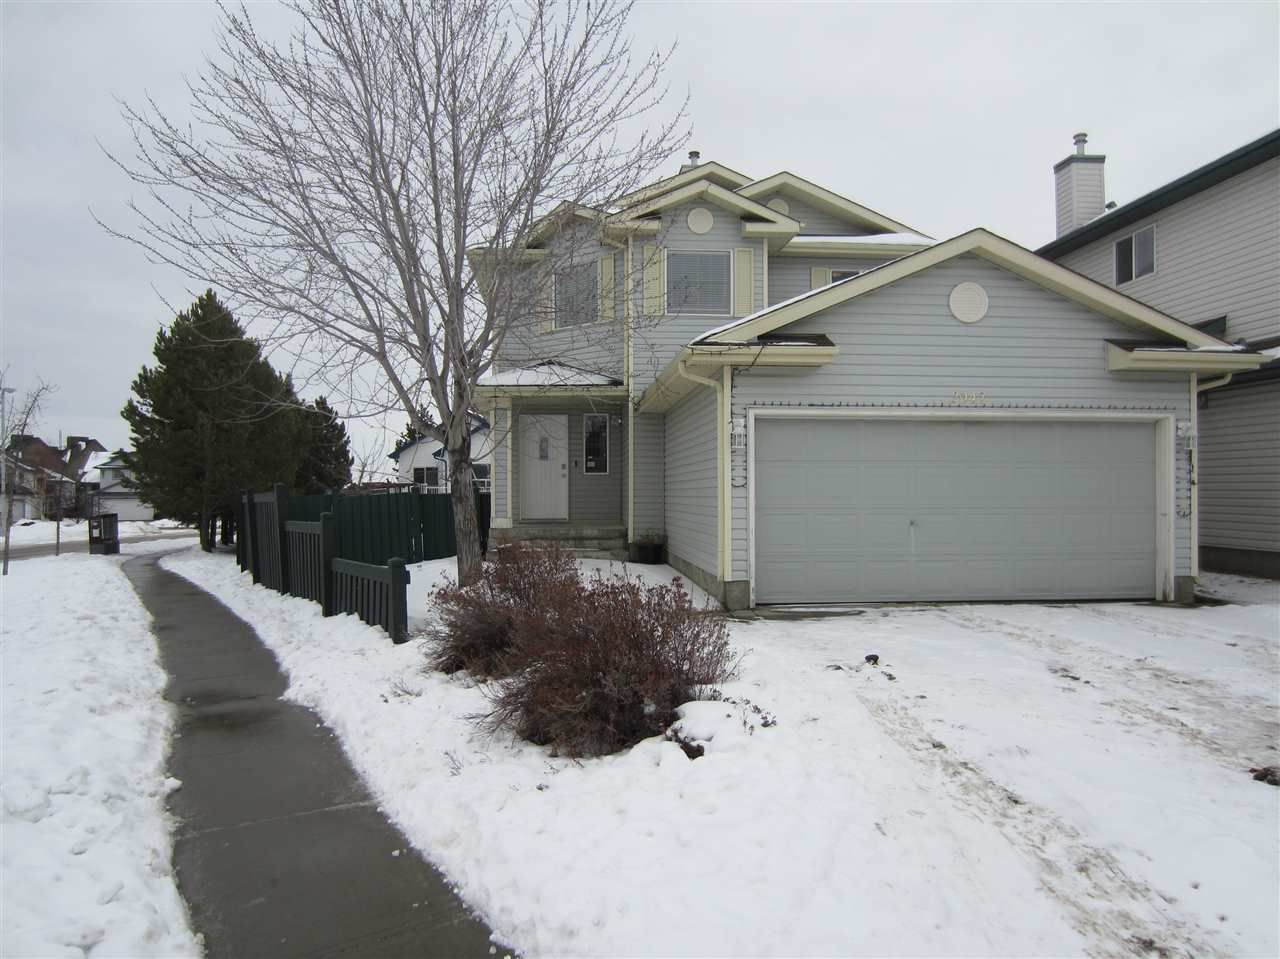 Main Photo: 2047 GARNETT Way in Edmonton: Zone 58 House for sale : MLS®# E4141886